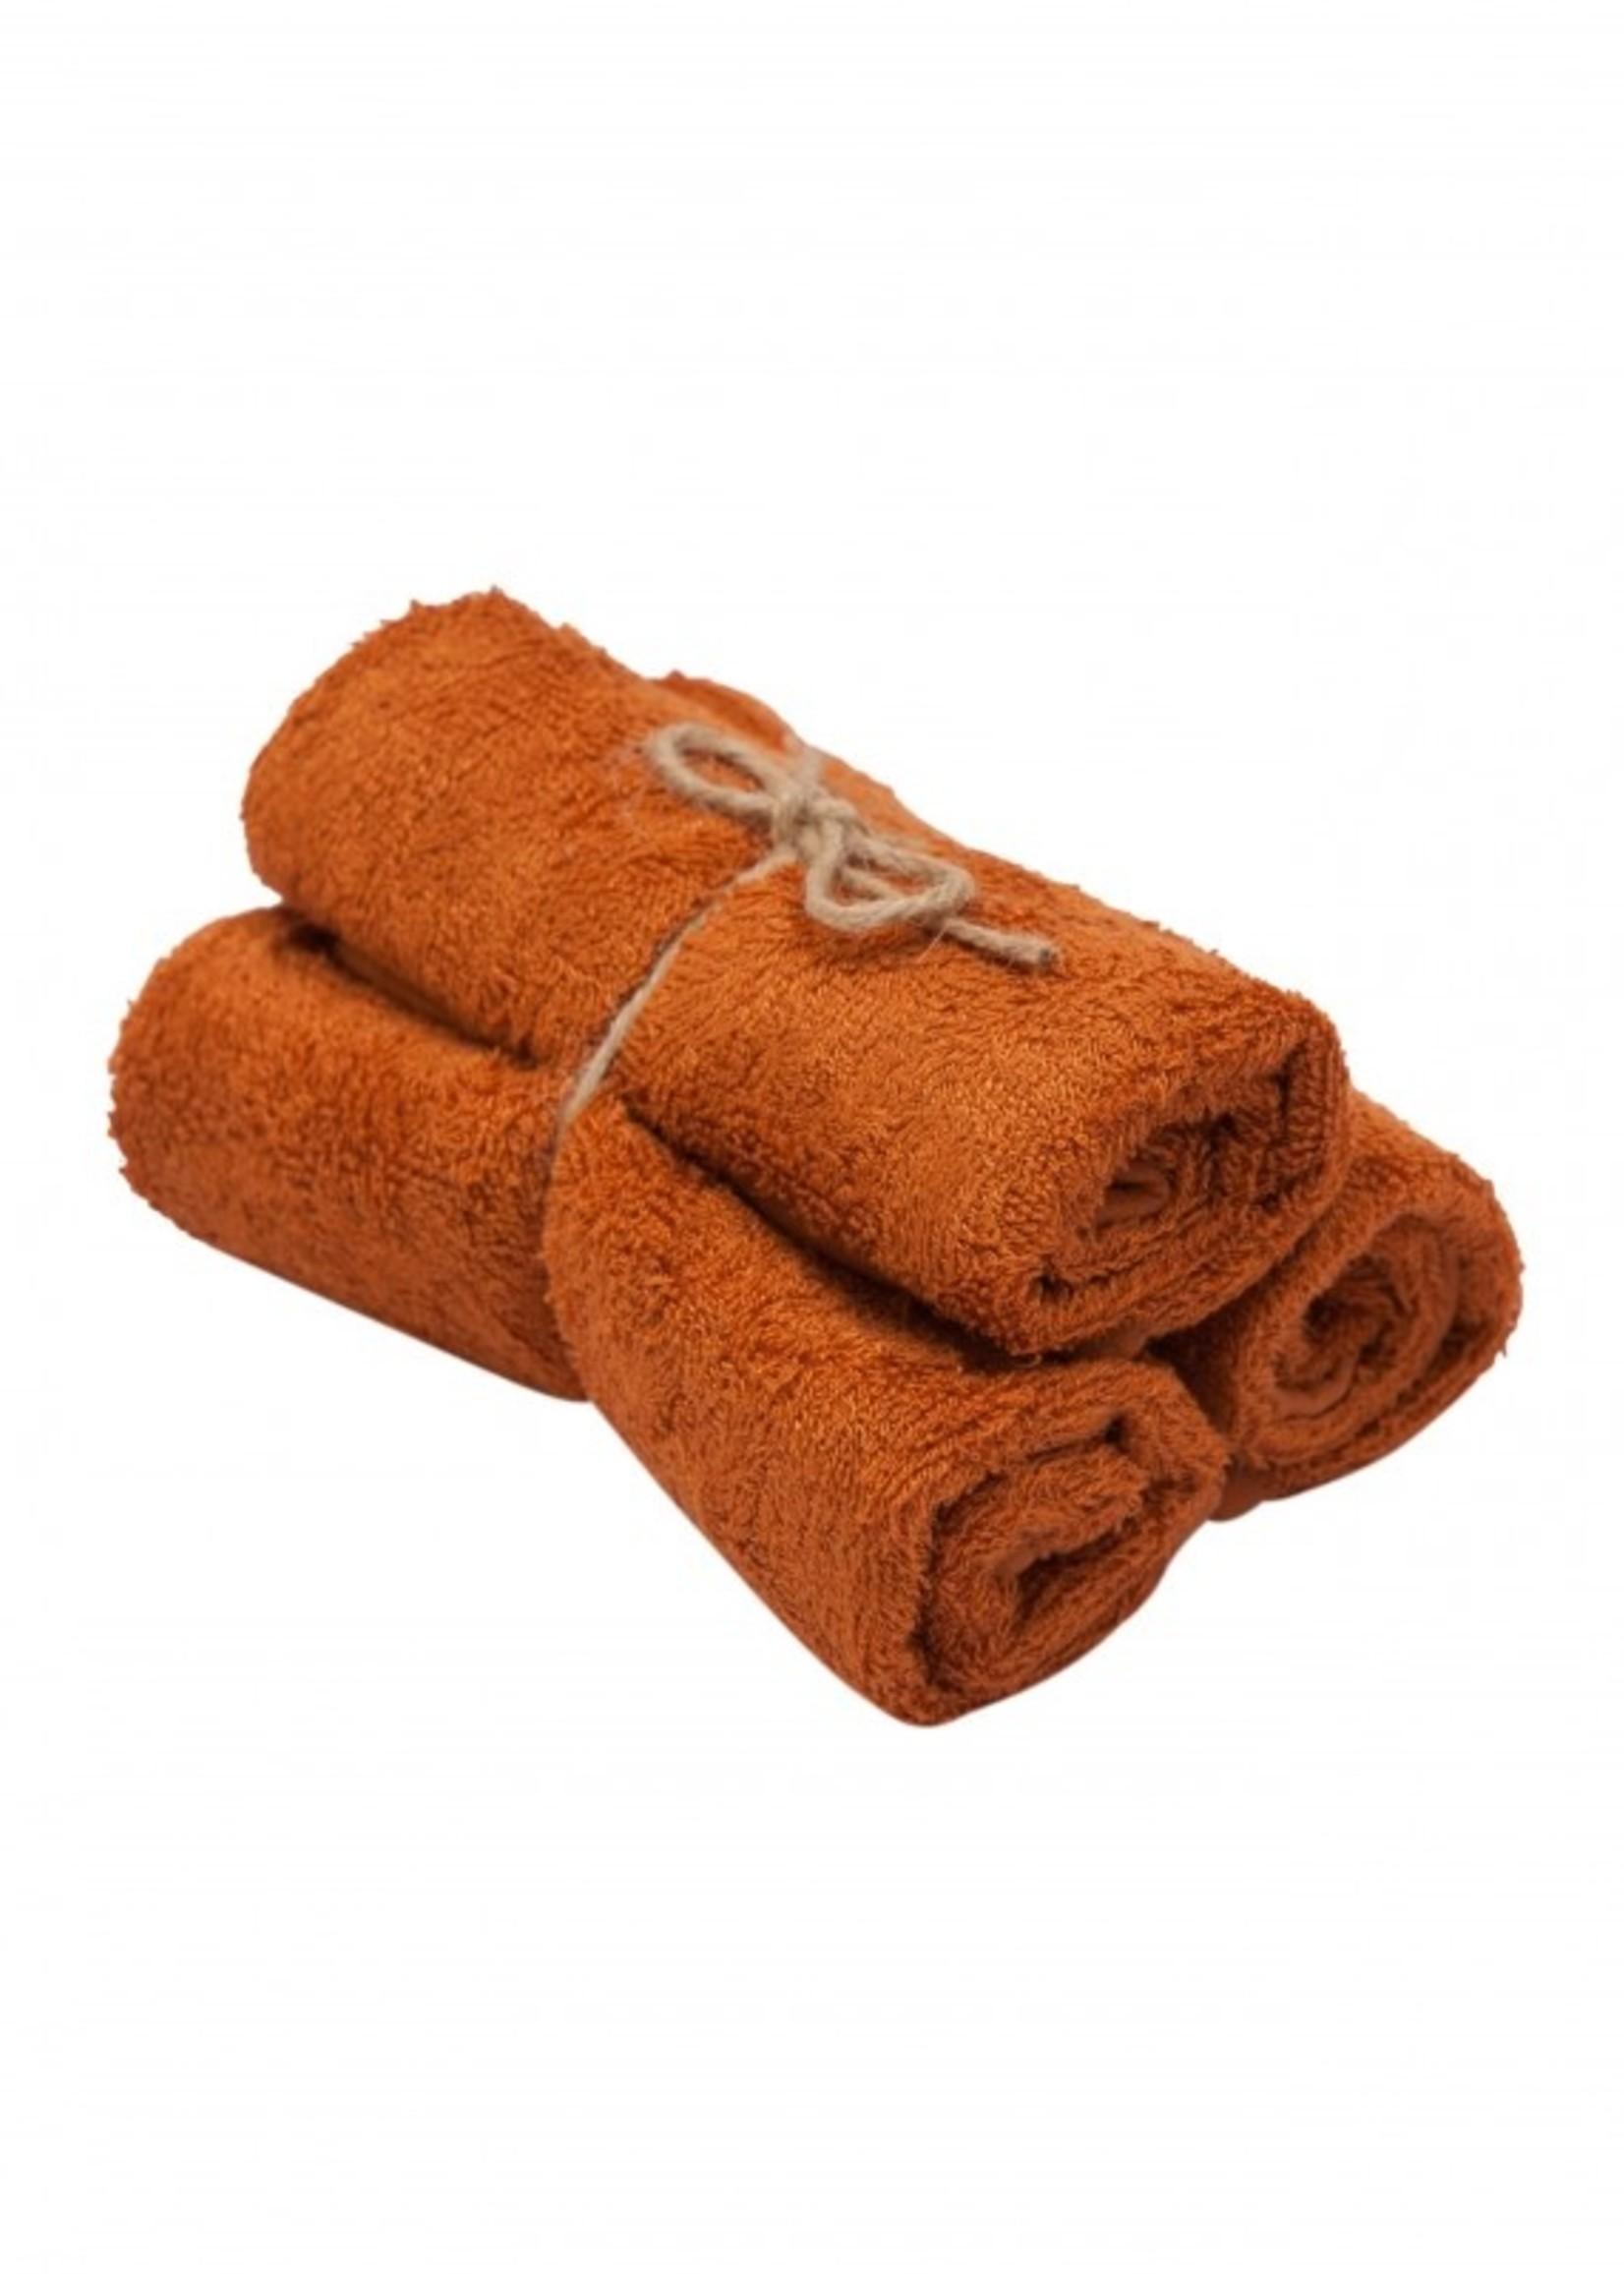 Timboo Set 3 Small Towels - Inca Rust